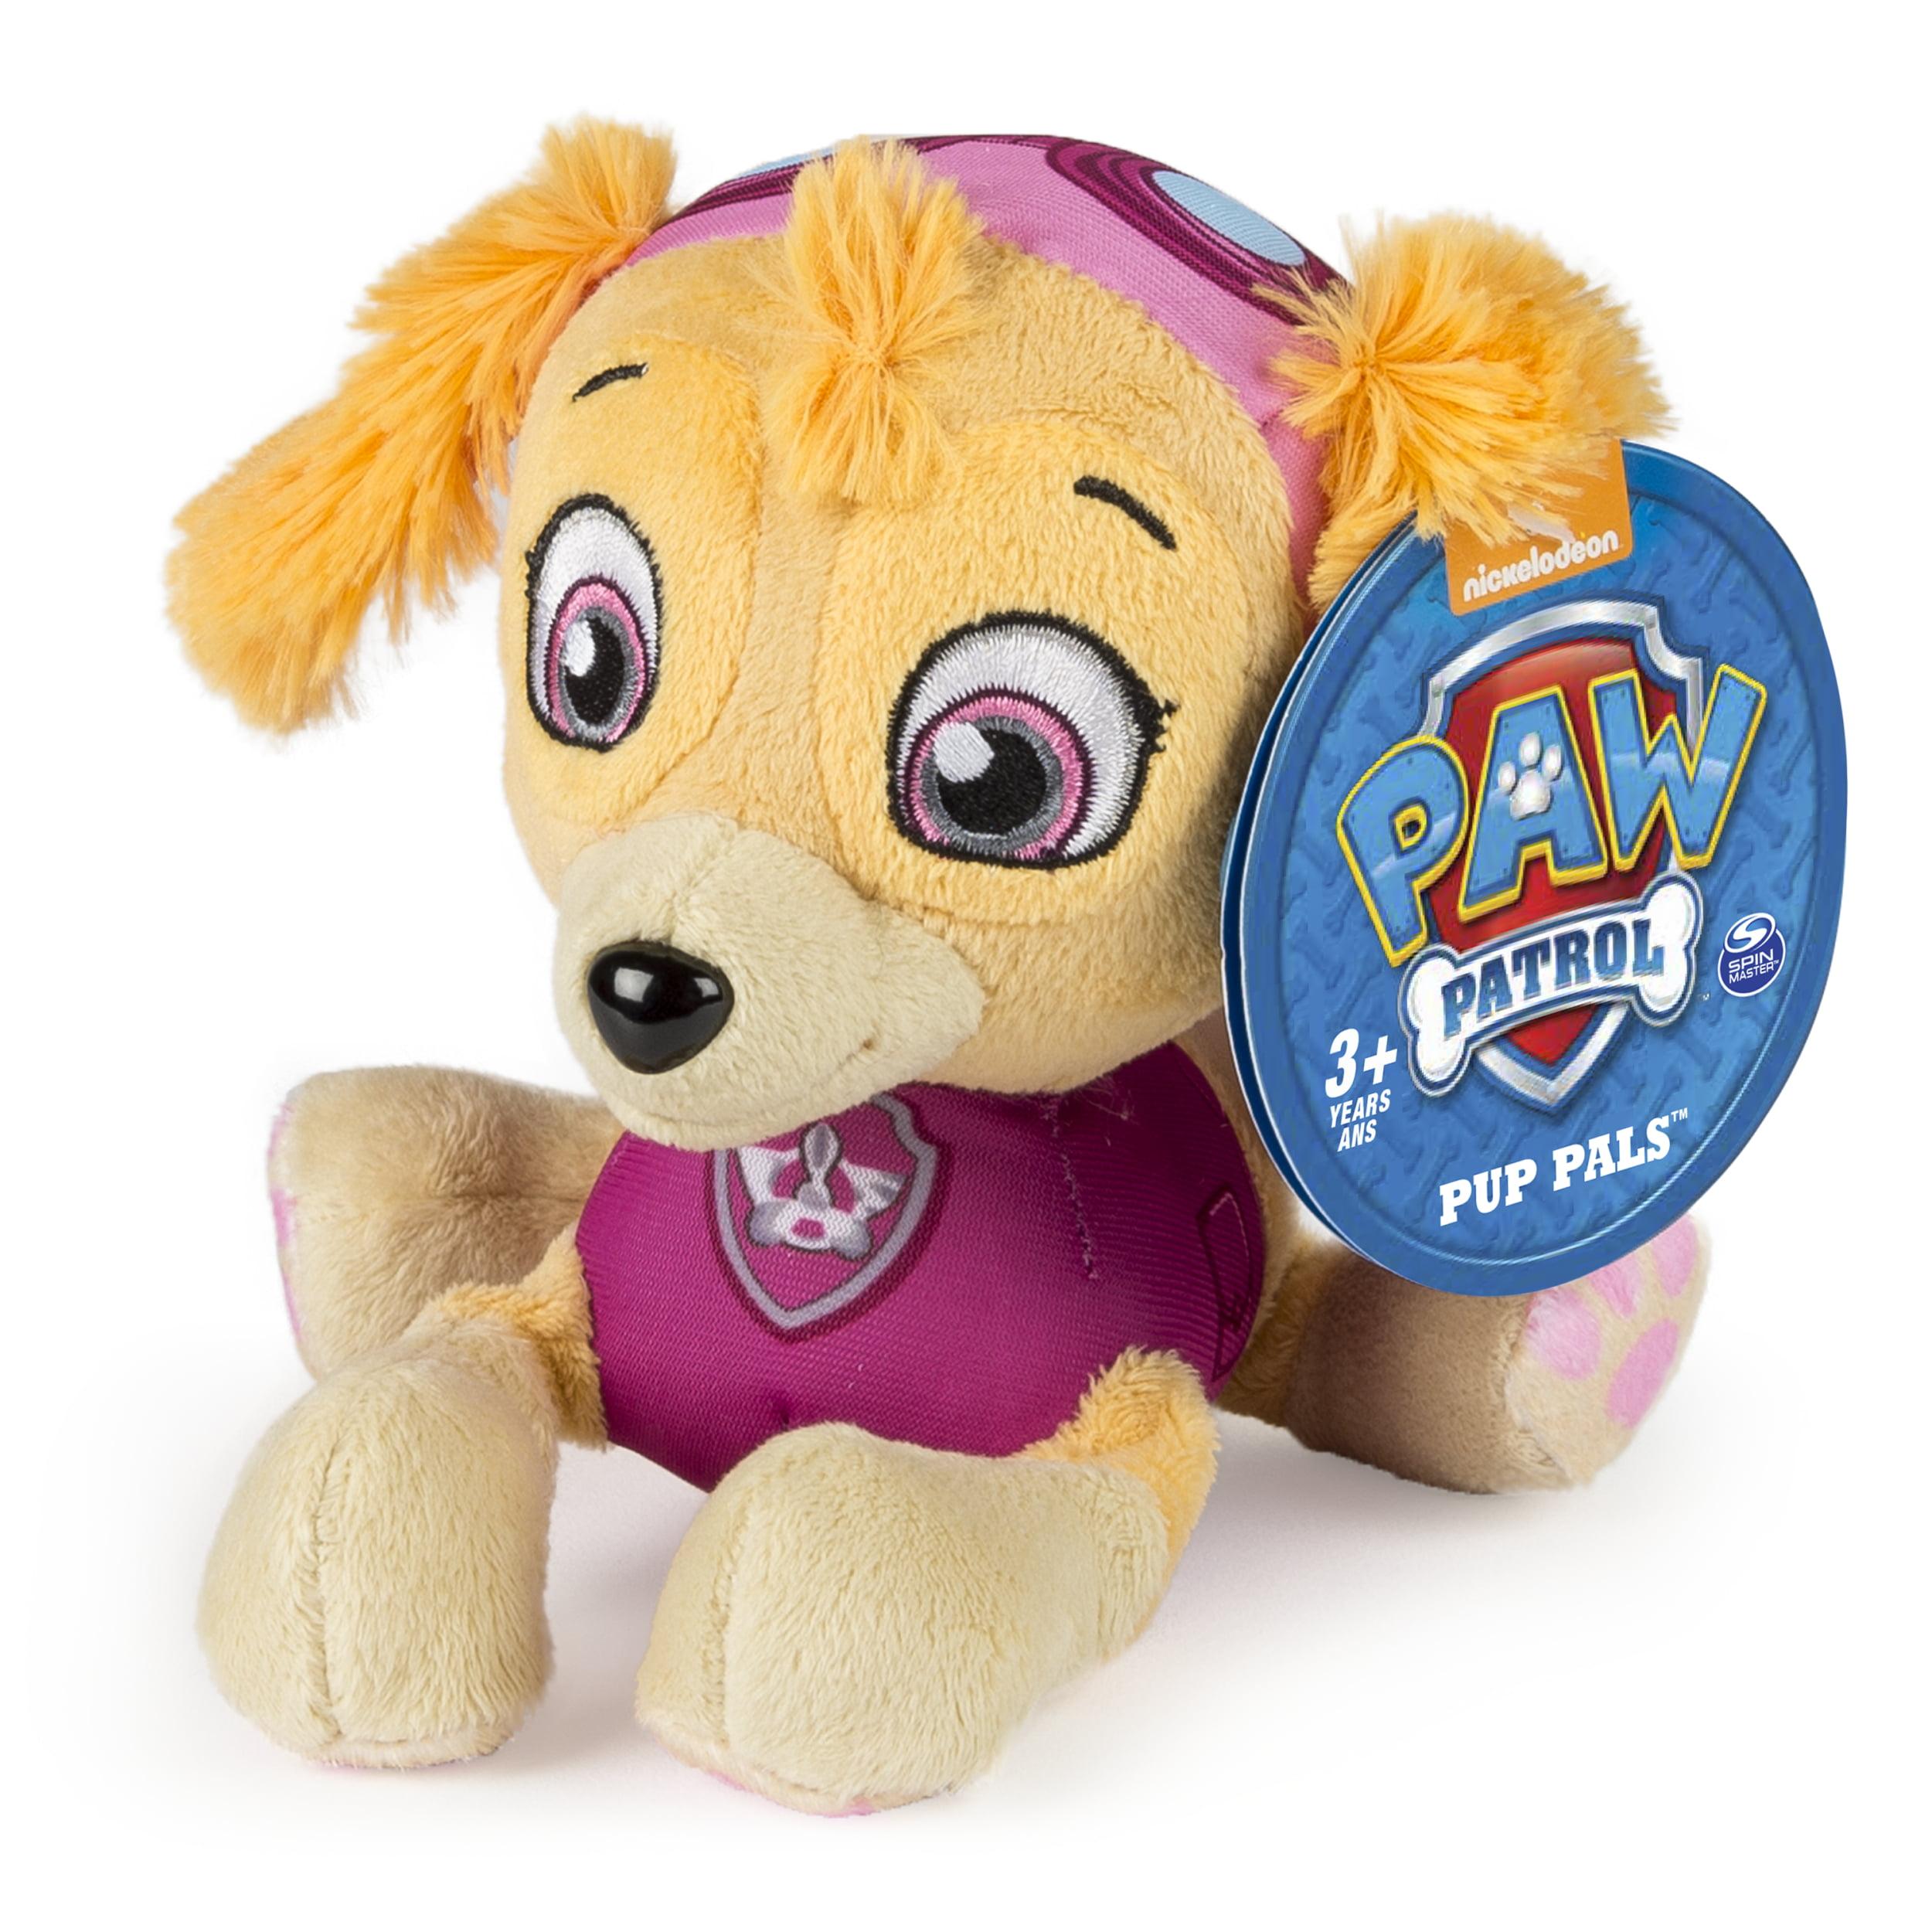 Paw Patrol Plush Pup Pals, Skye